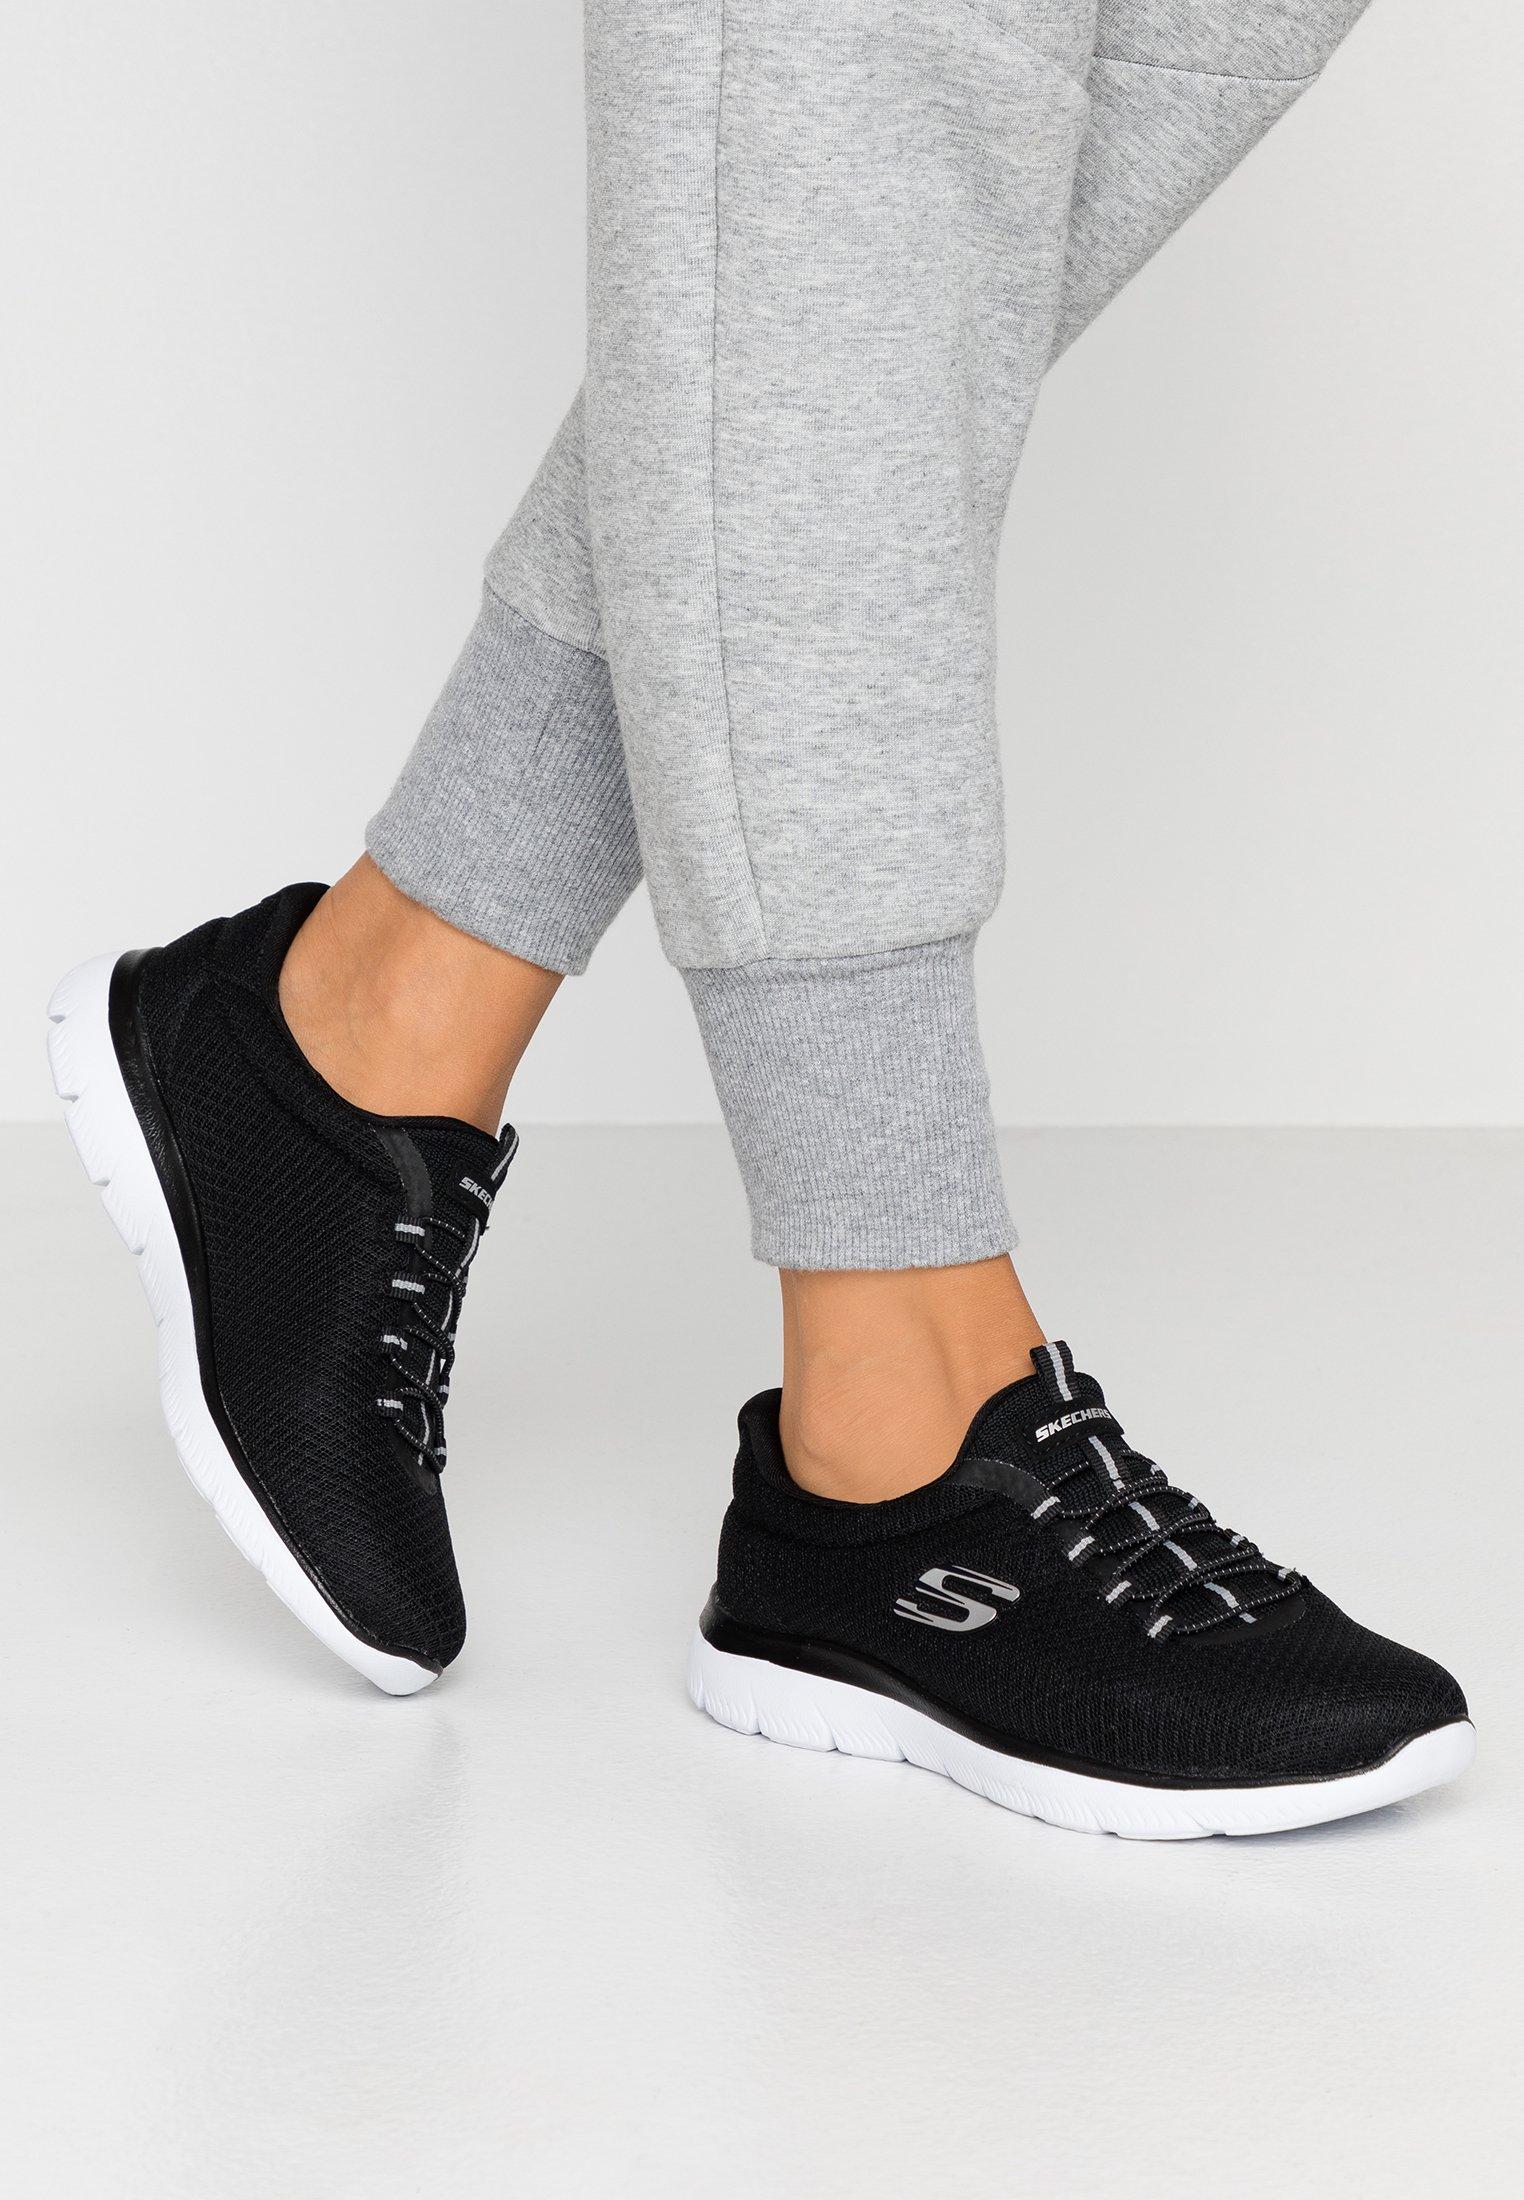 Women SUMMITS - Slip-ons - black/white